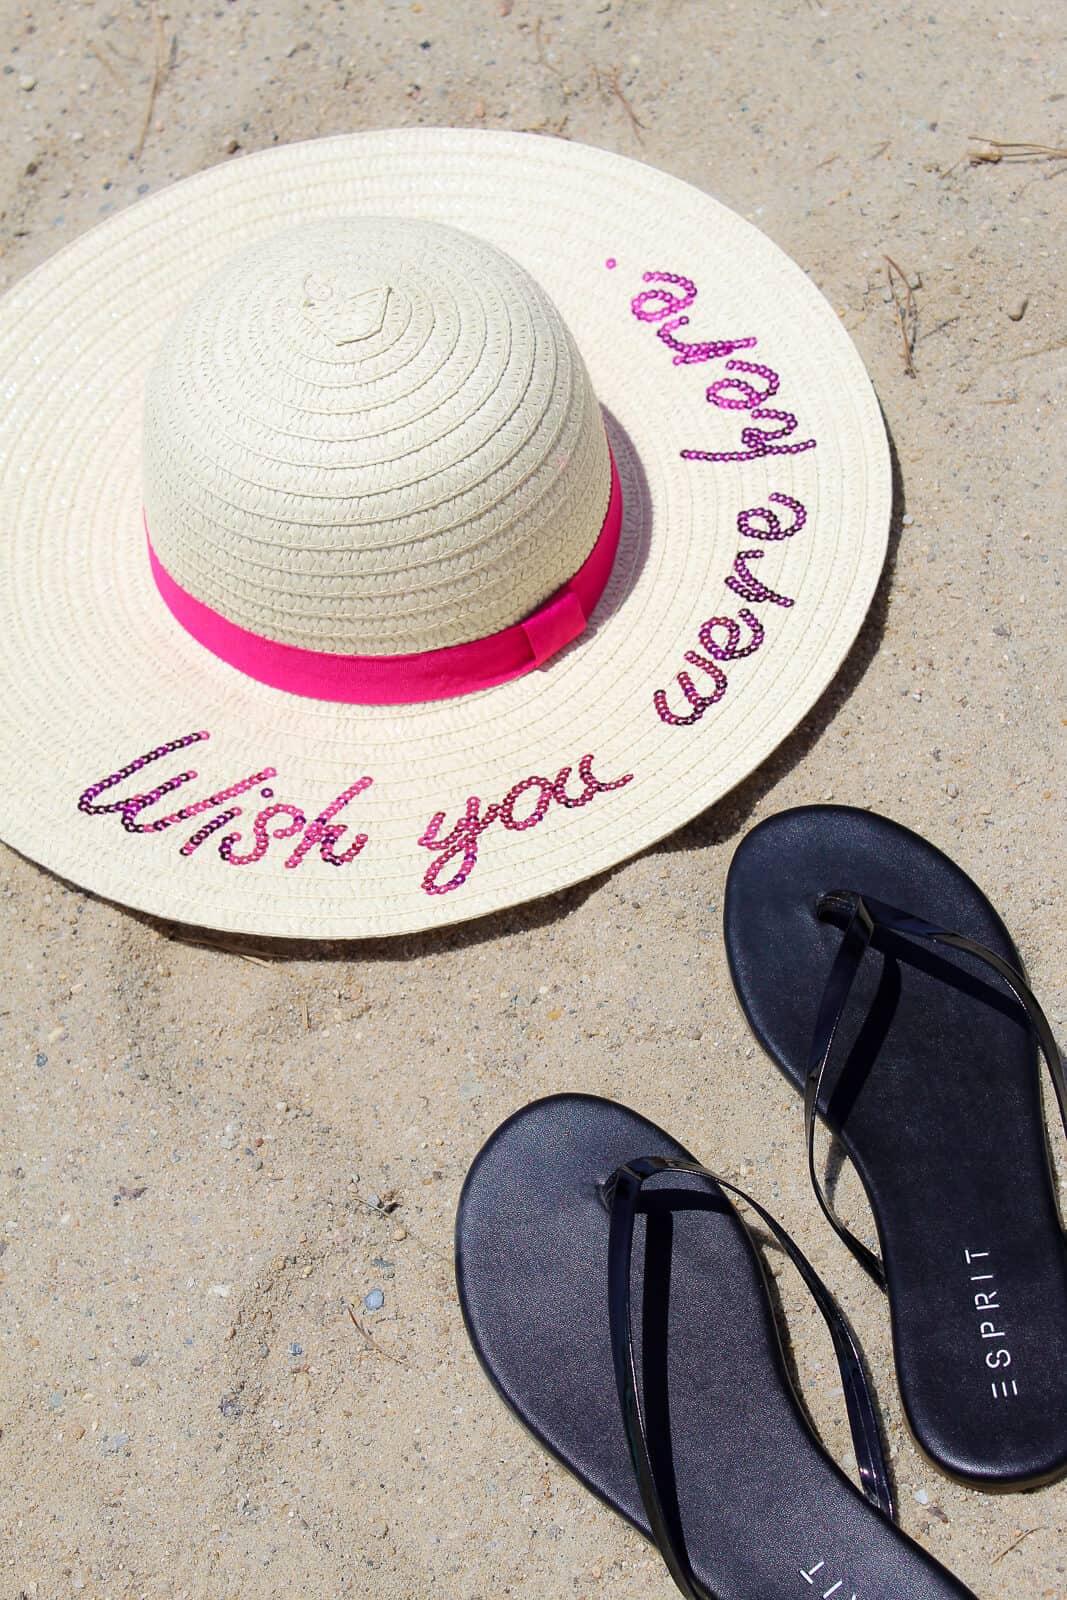 Wish you were here summer hat lays on beach next to black flip flops.